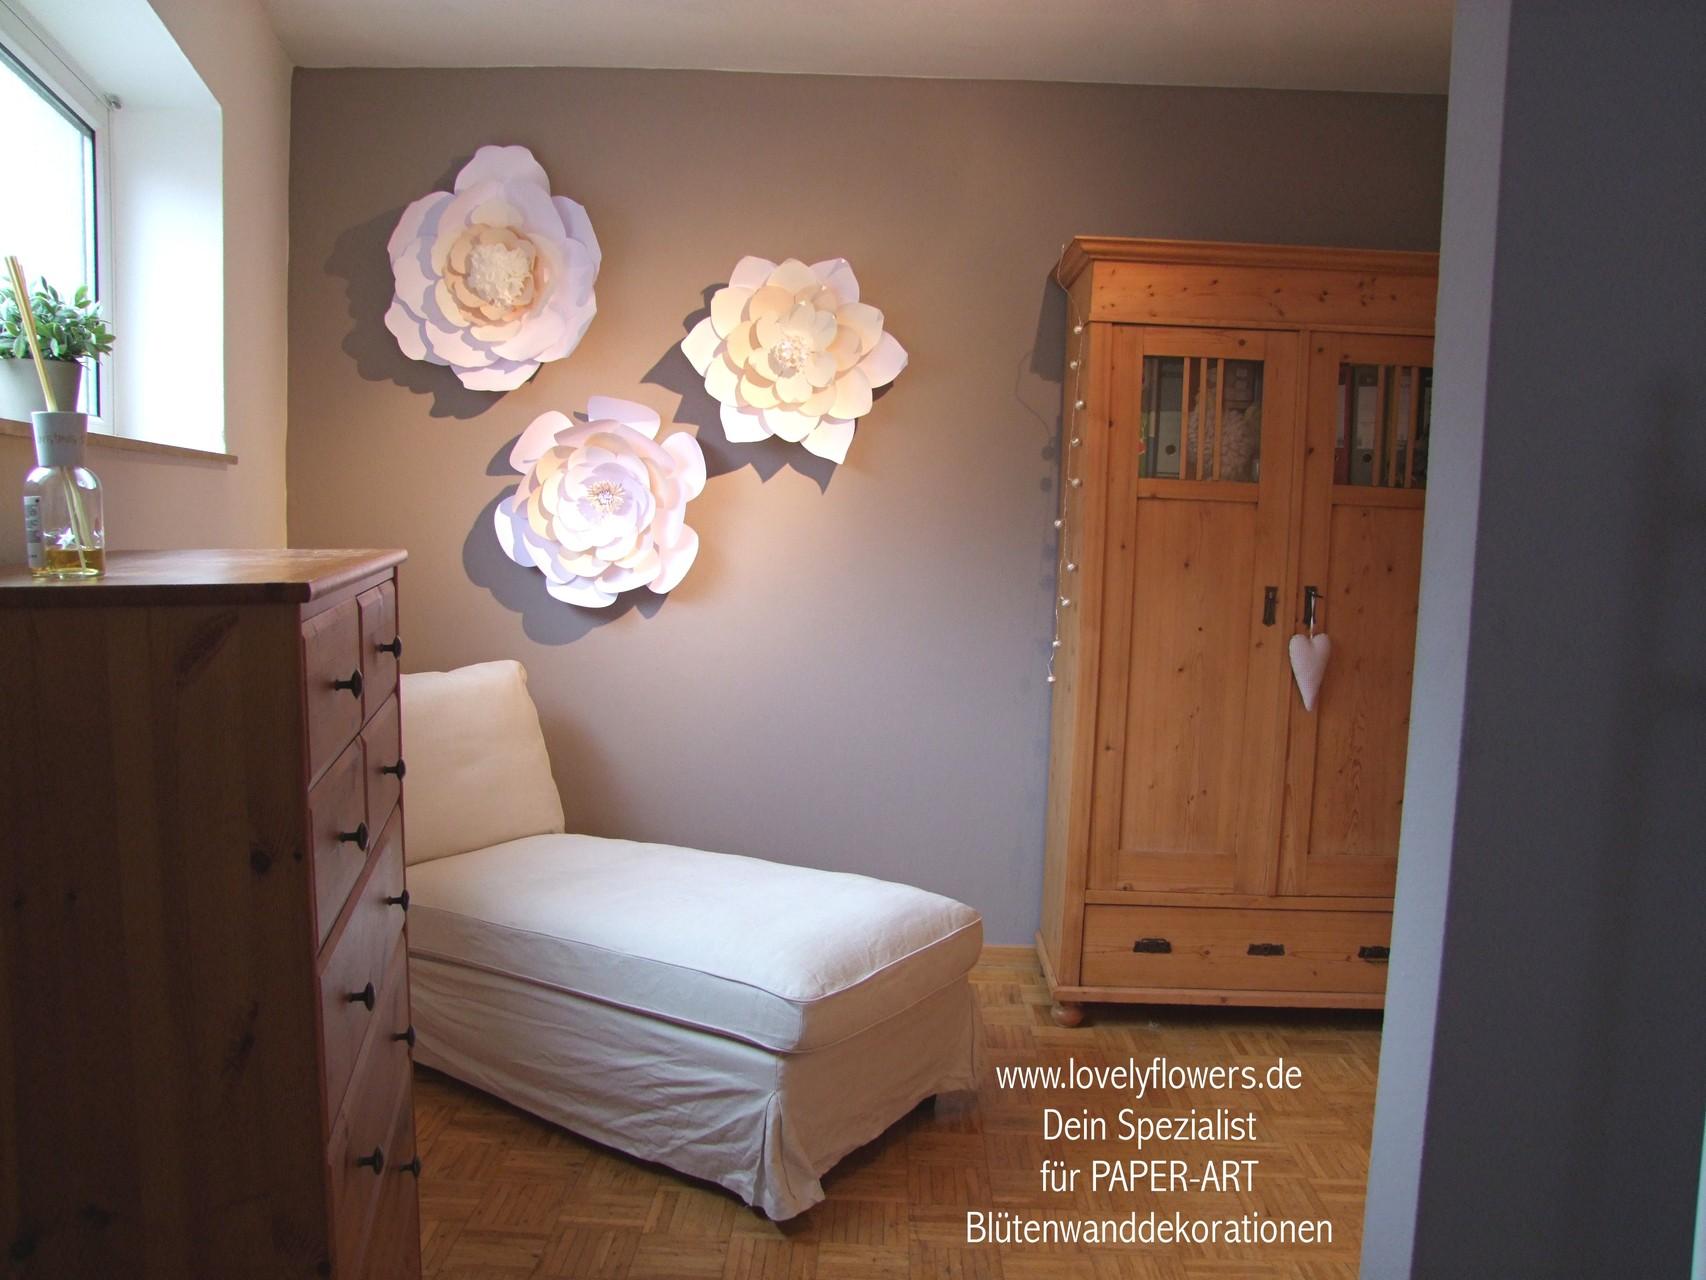 www.lovelyflowers.de - Dein Spezialist für PAPER-ART Blütenwandtatoos!